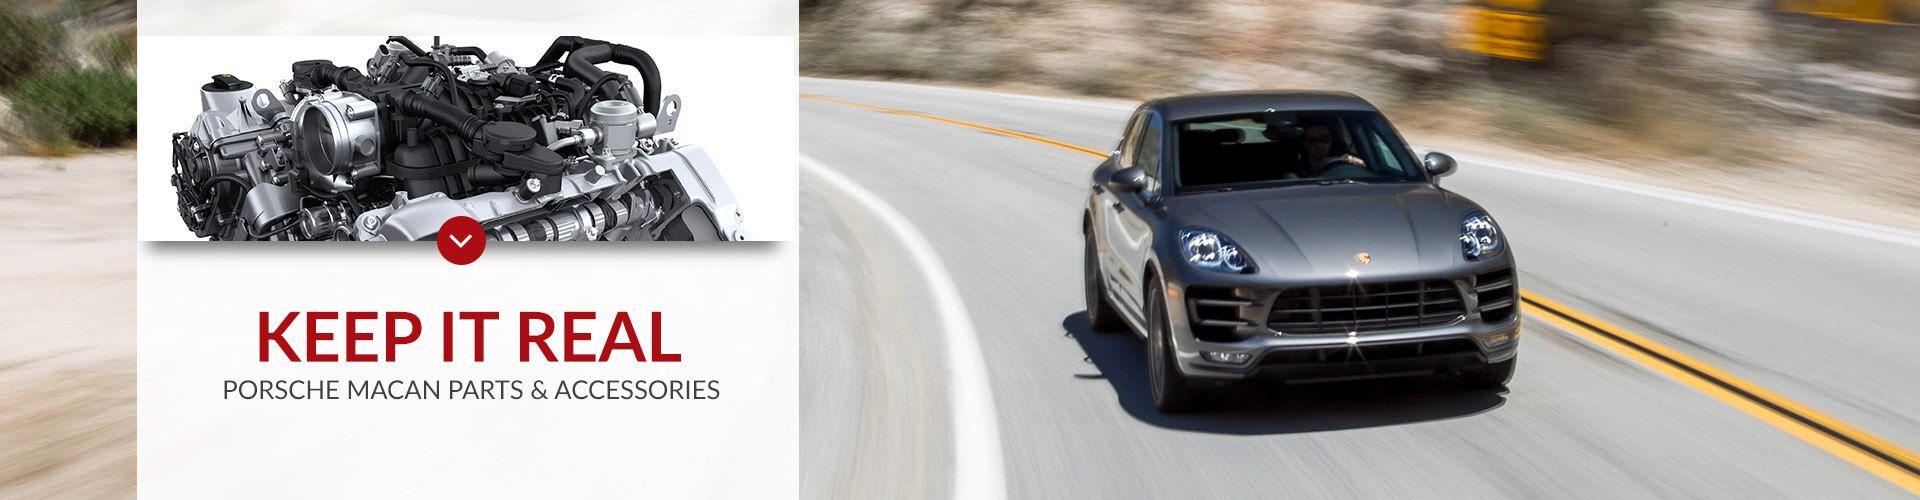 Porsche Macan Parts